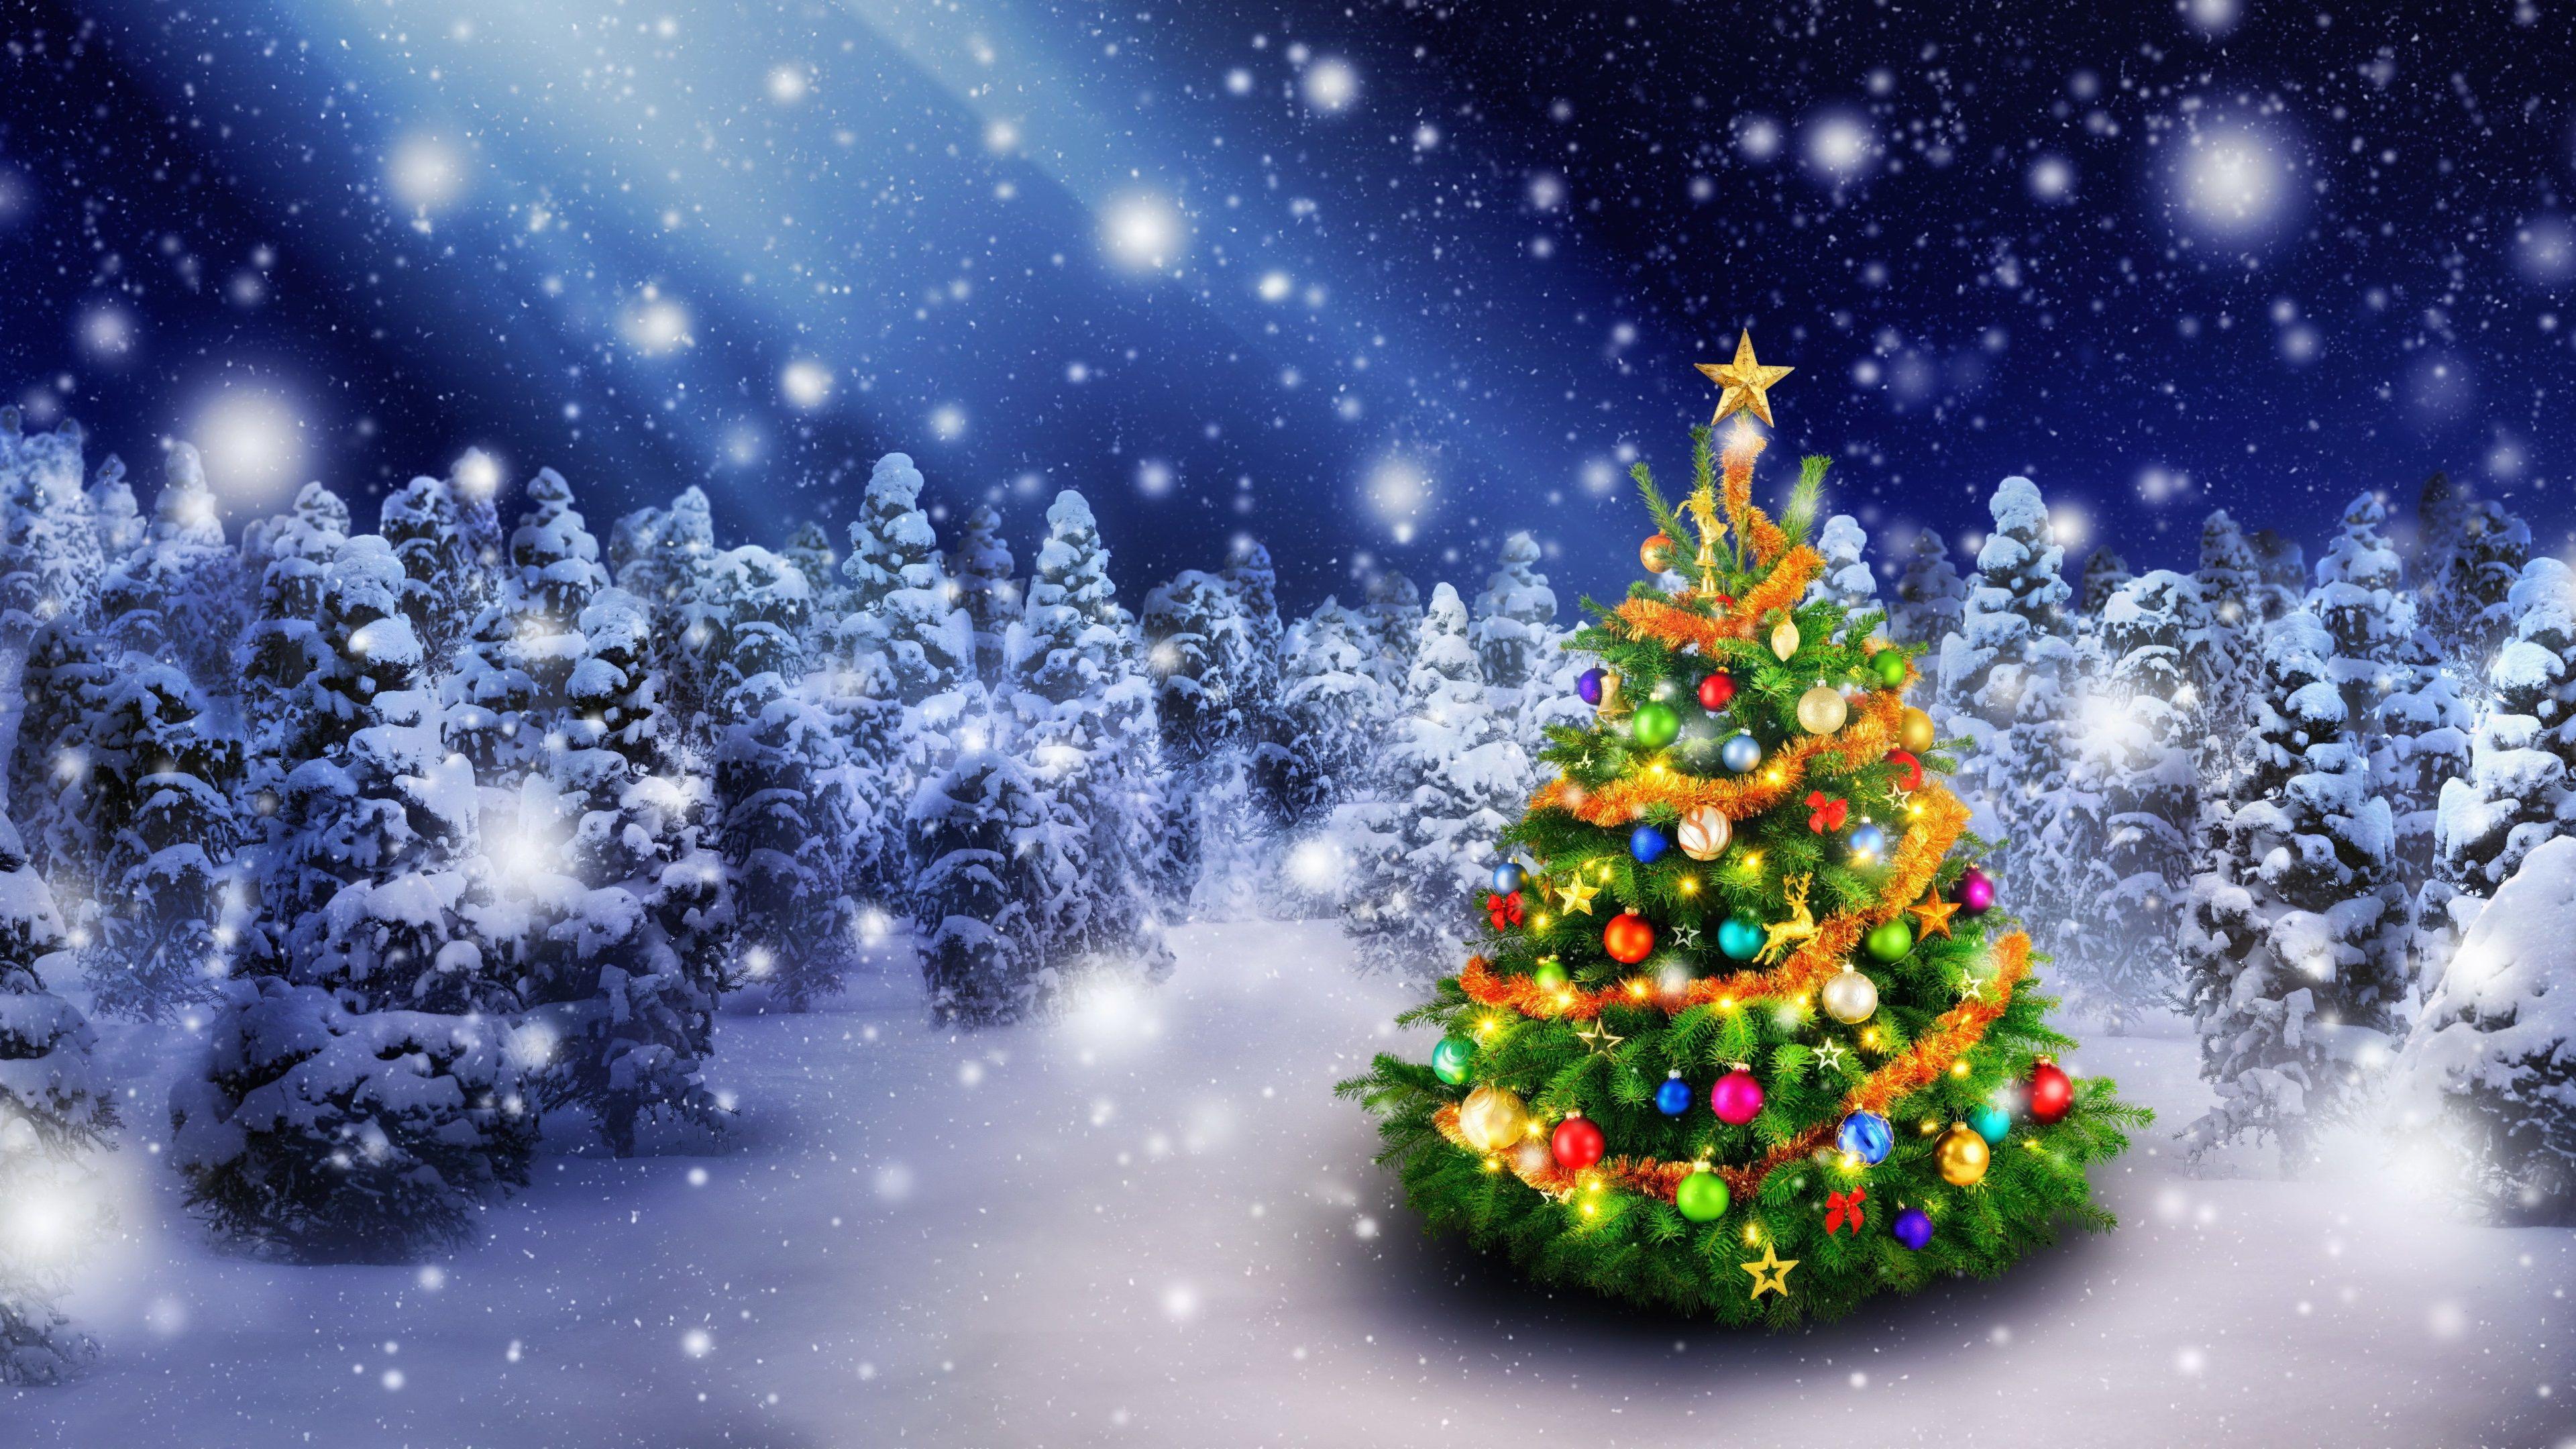 3840x2160 Christmas Tree 4k Free Full Hd Wallpaper Colorful Christmas Tree Christmas Tree Photography Christmas Tree Decorations